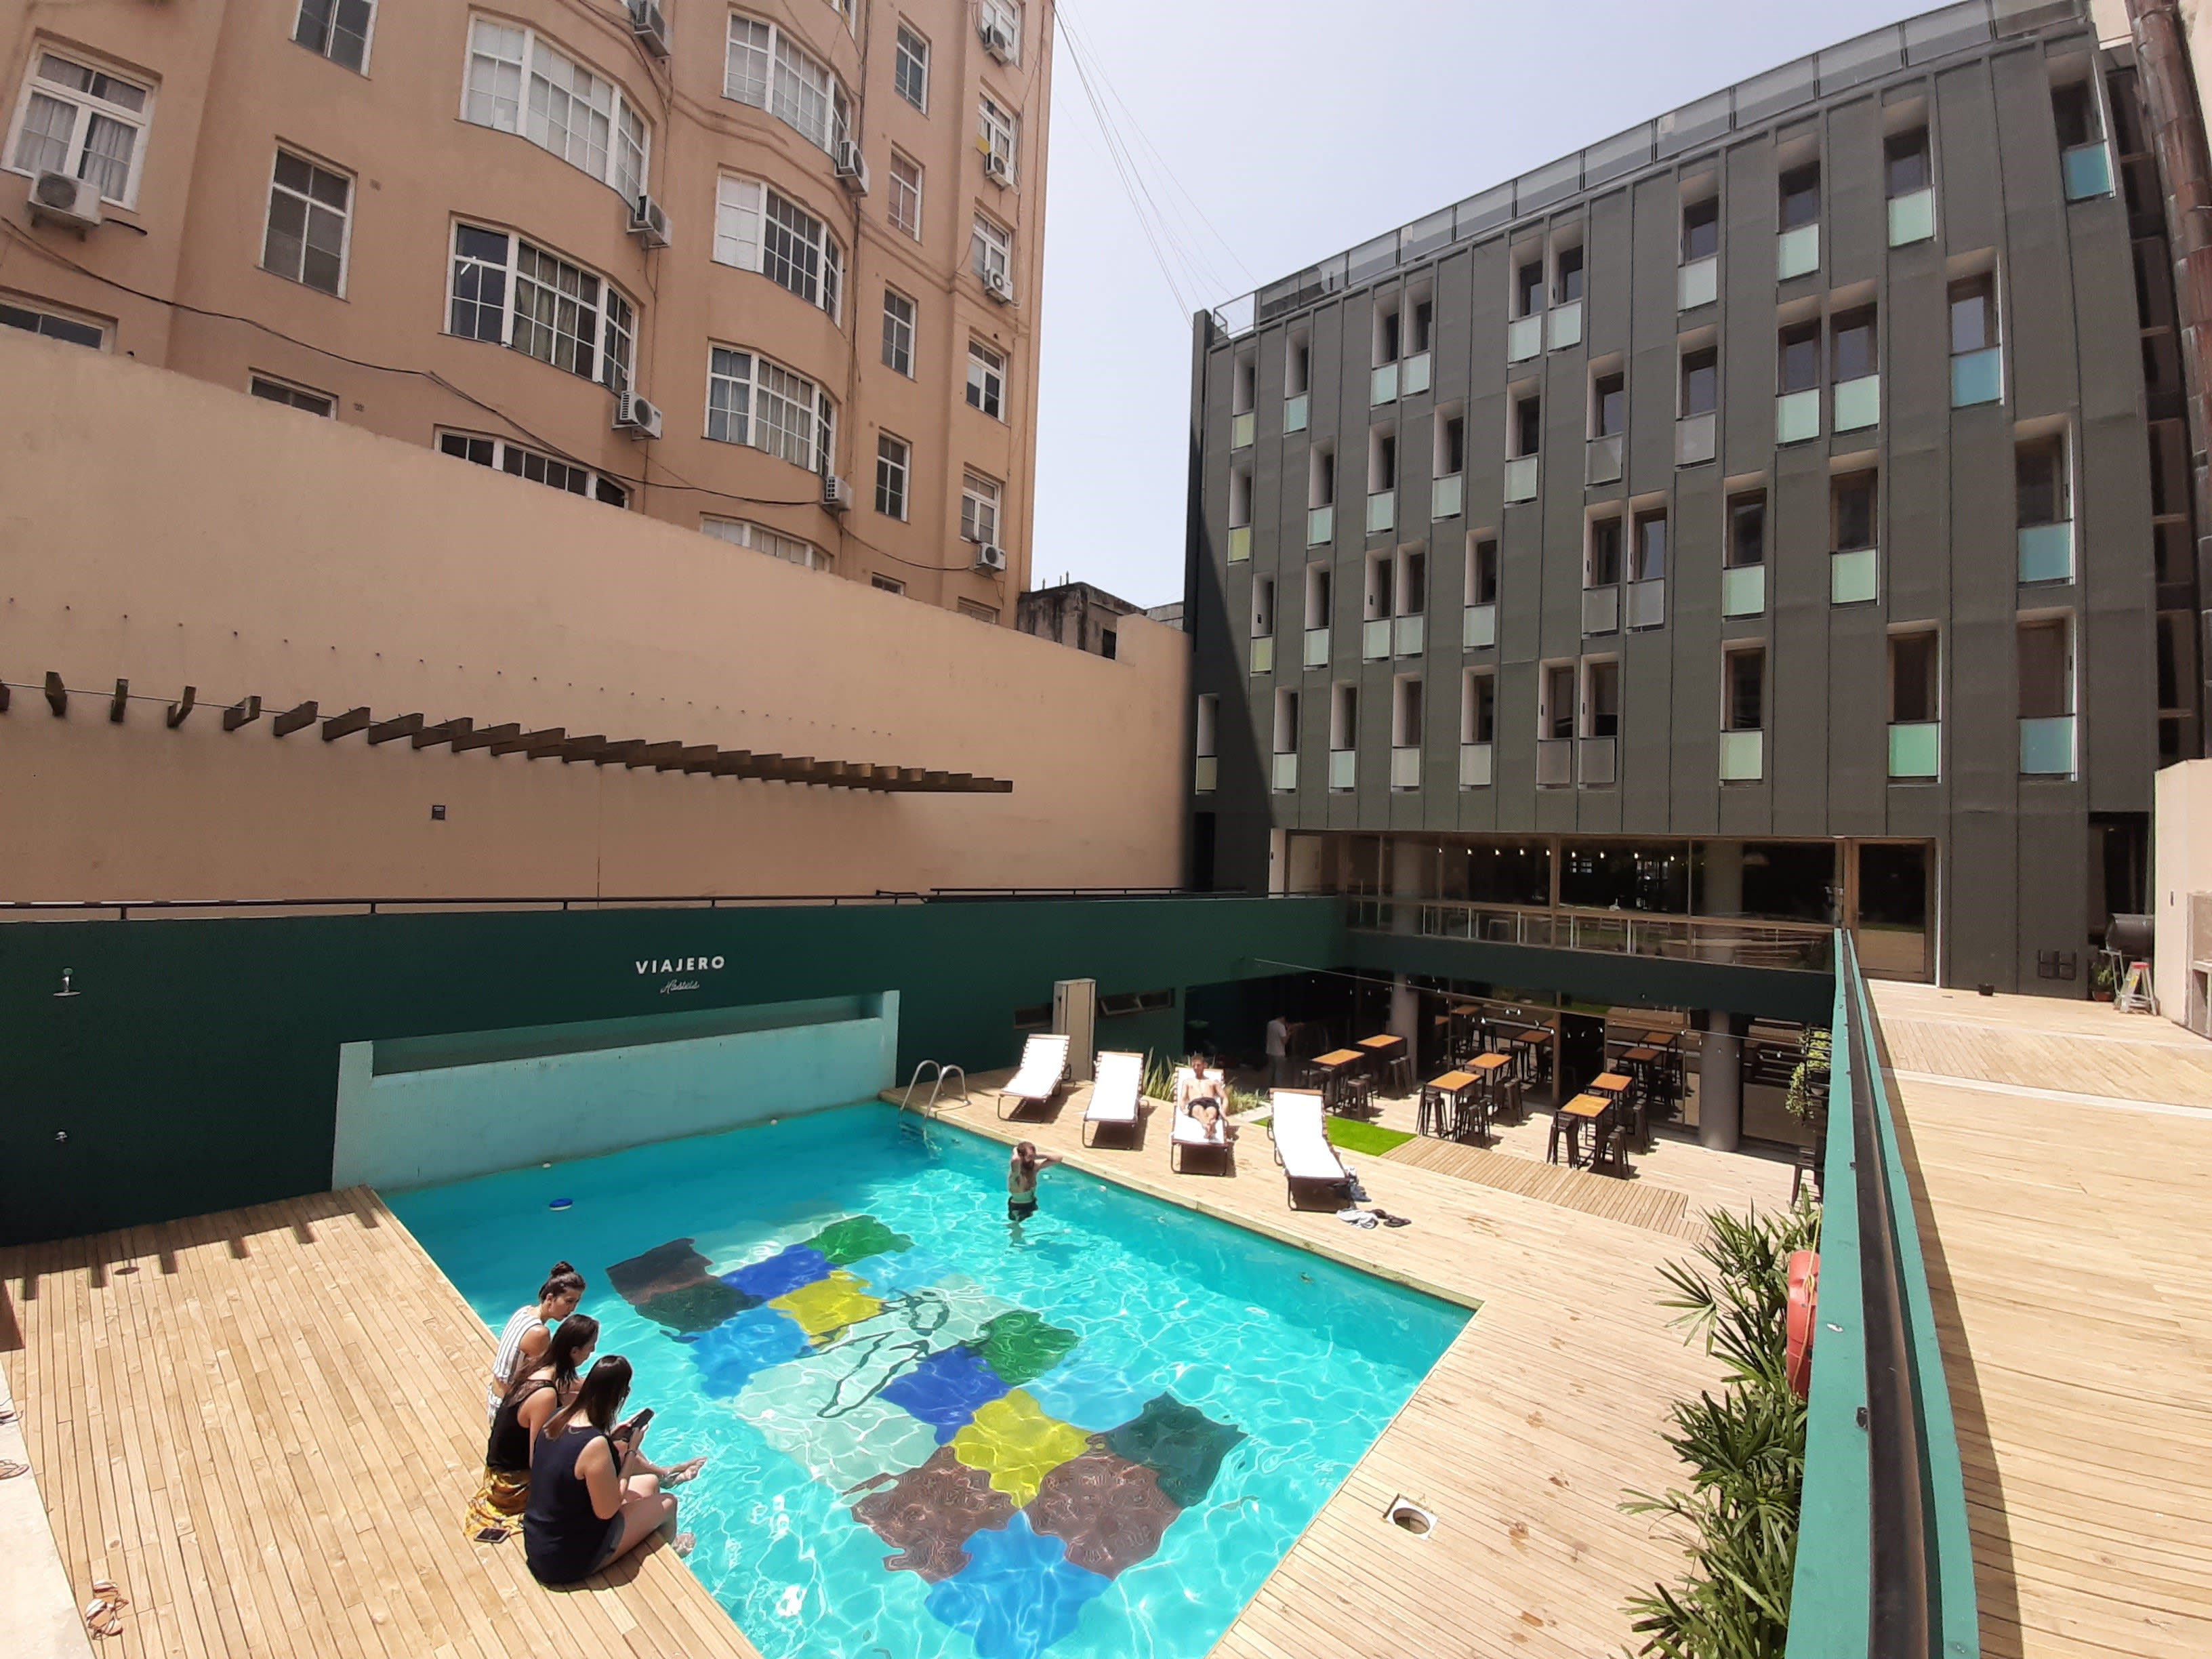 HOSTEL - Viajero Buenos Aires Hostel